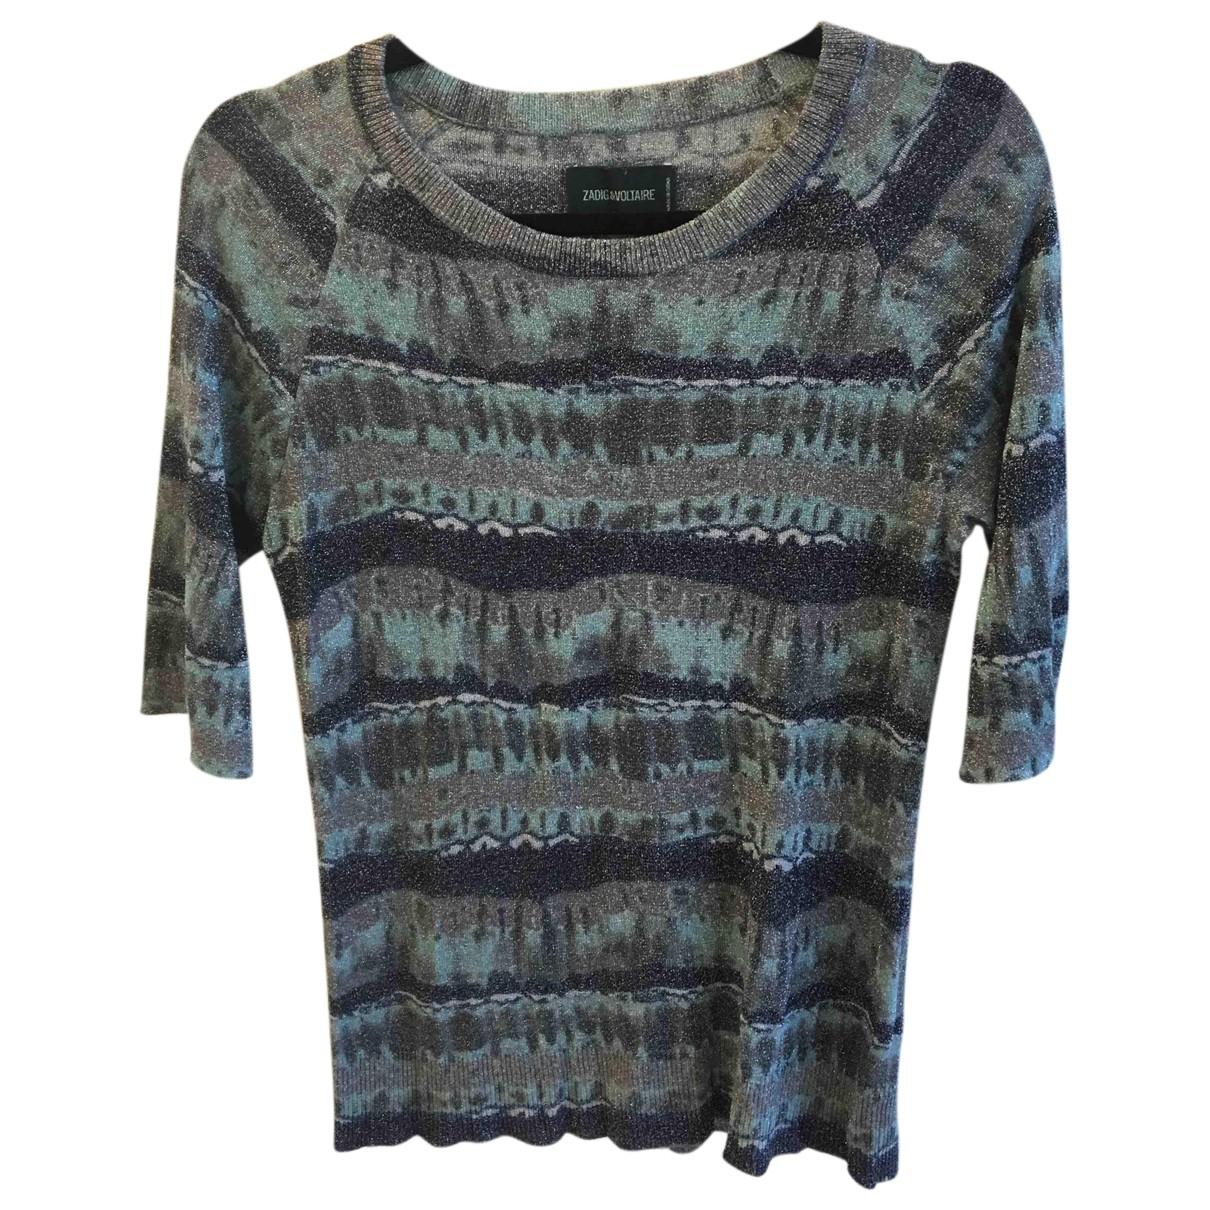 Zadig & Voltaire N Metallic Knitwear for Women S International